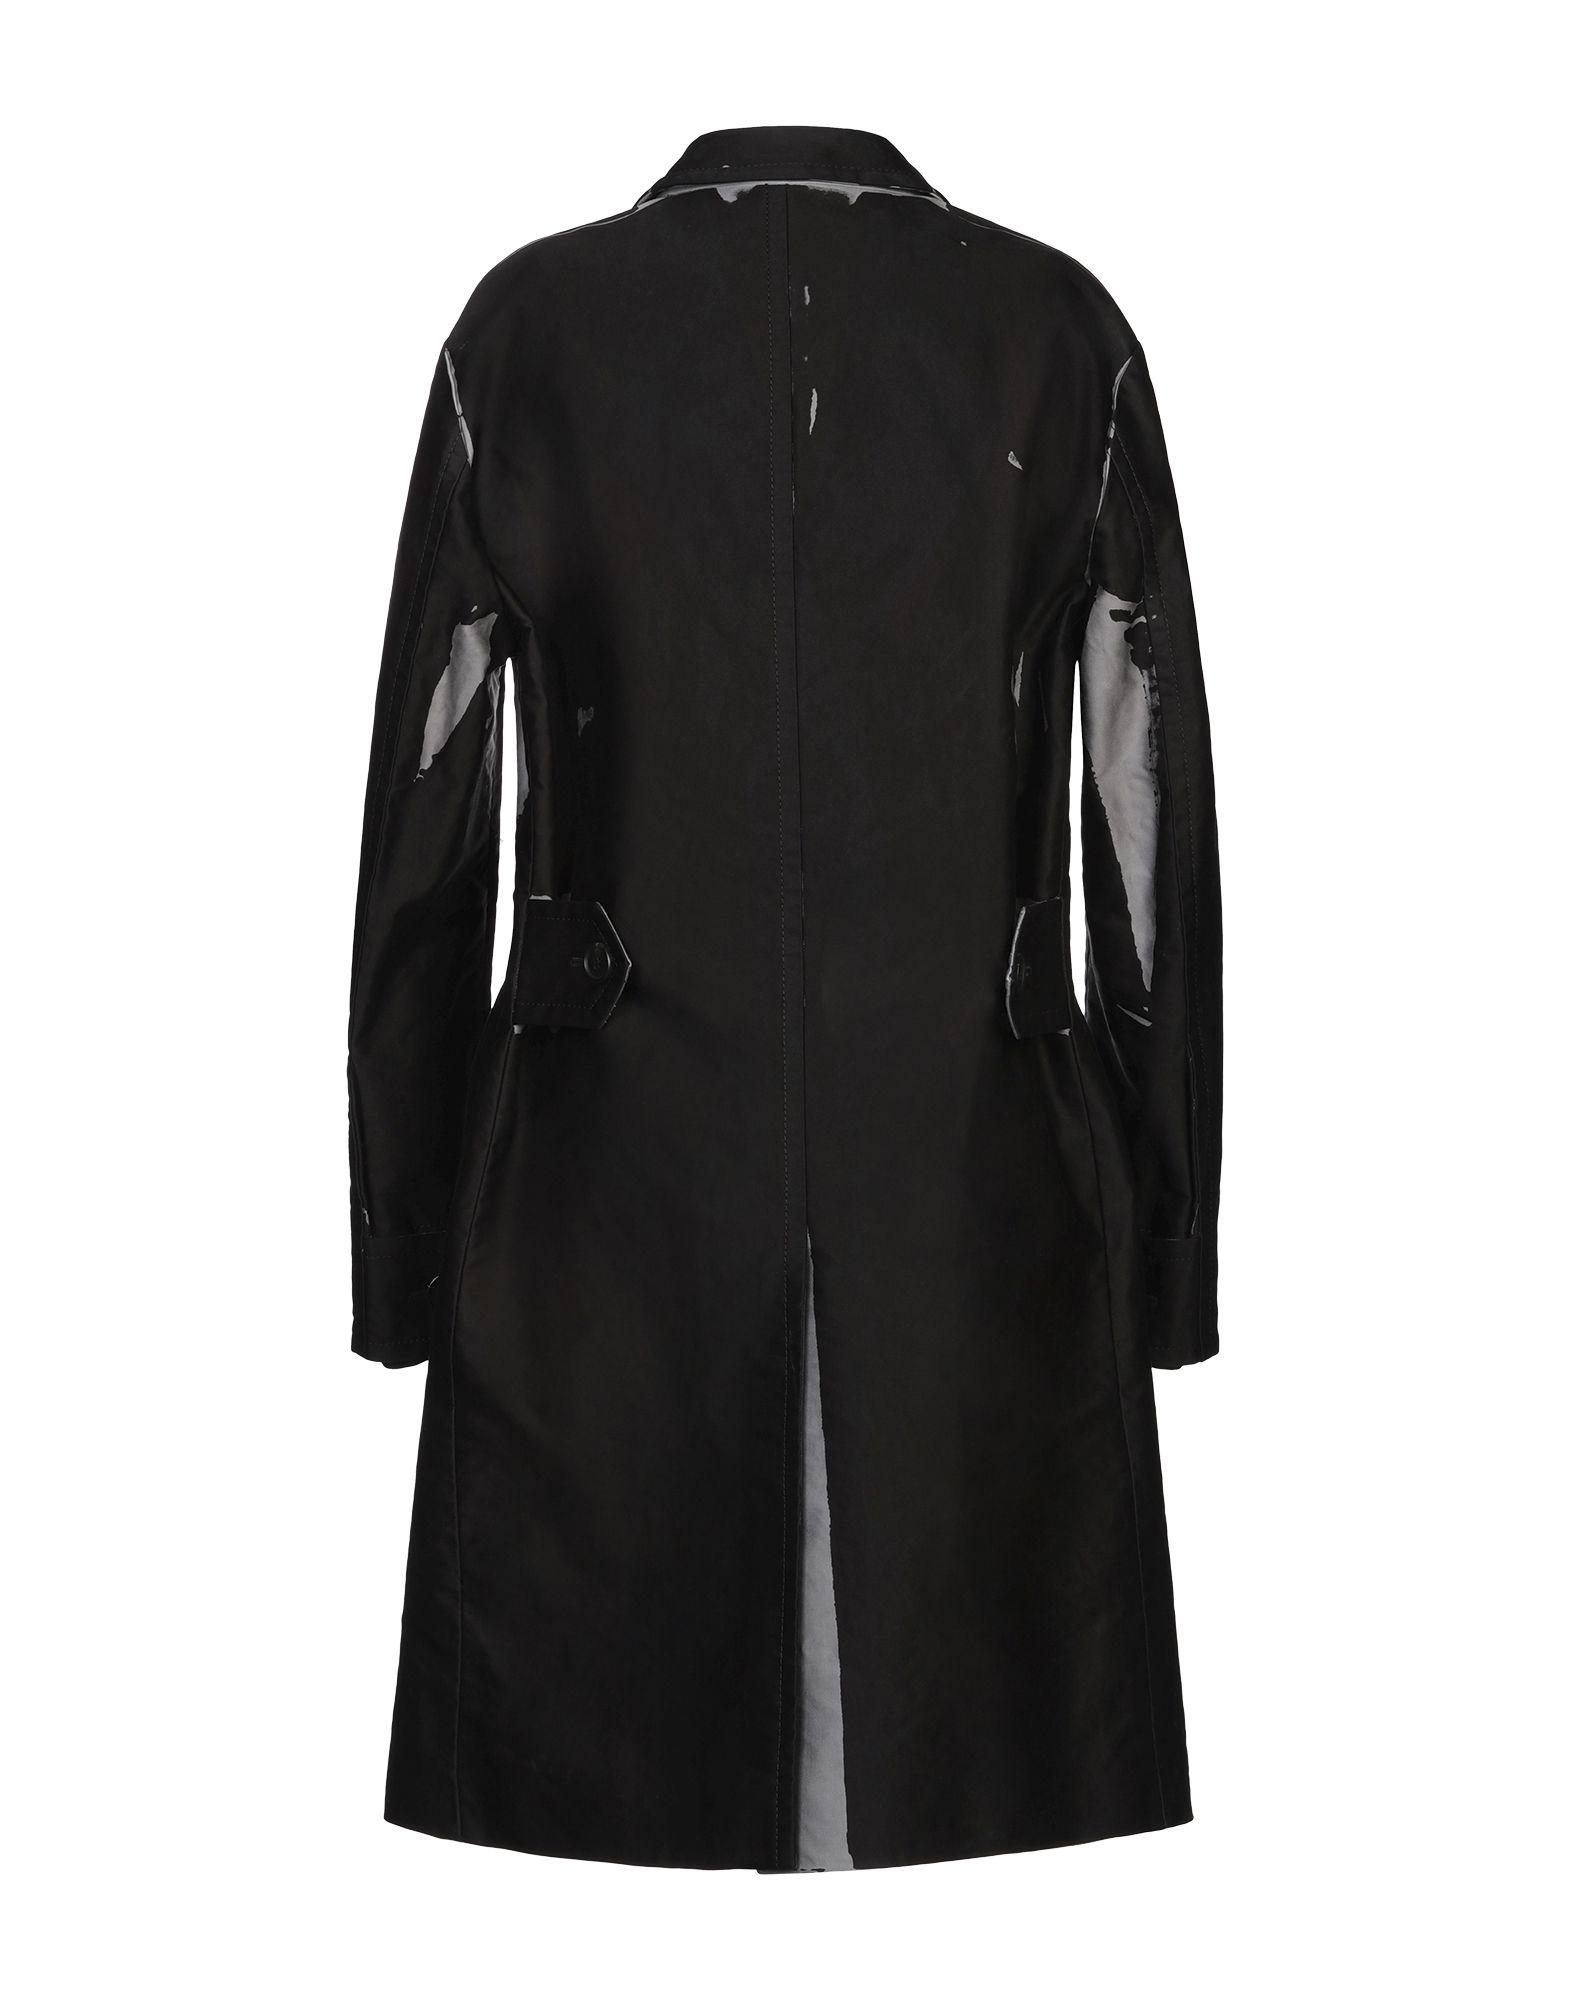 Manteau long Coton Prada en coloris Noir SyV3h